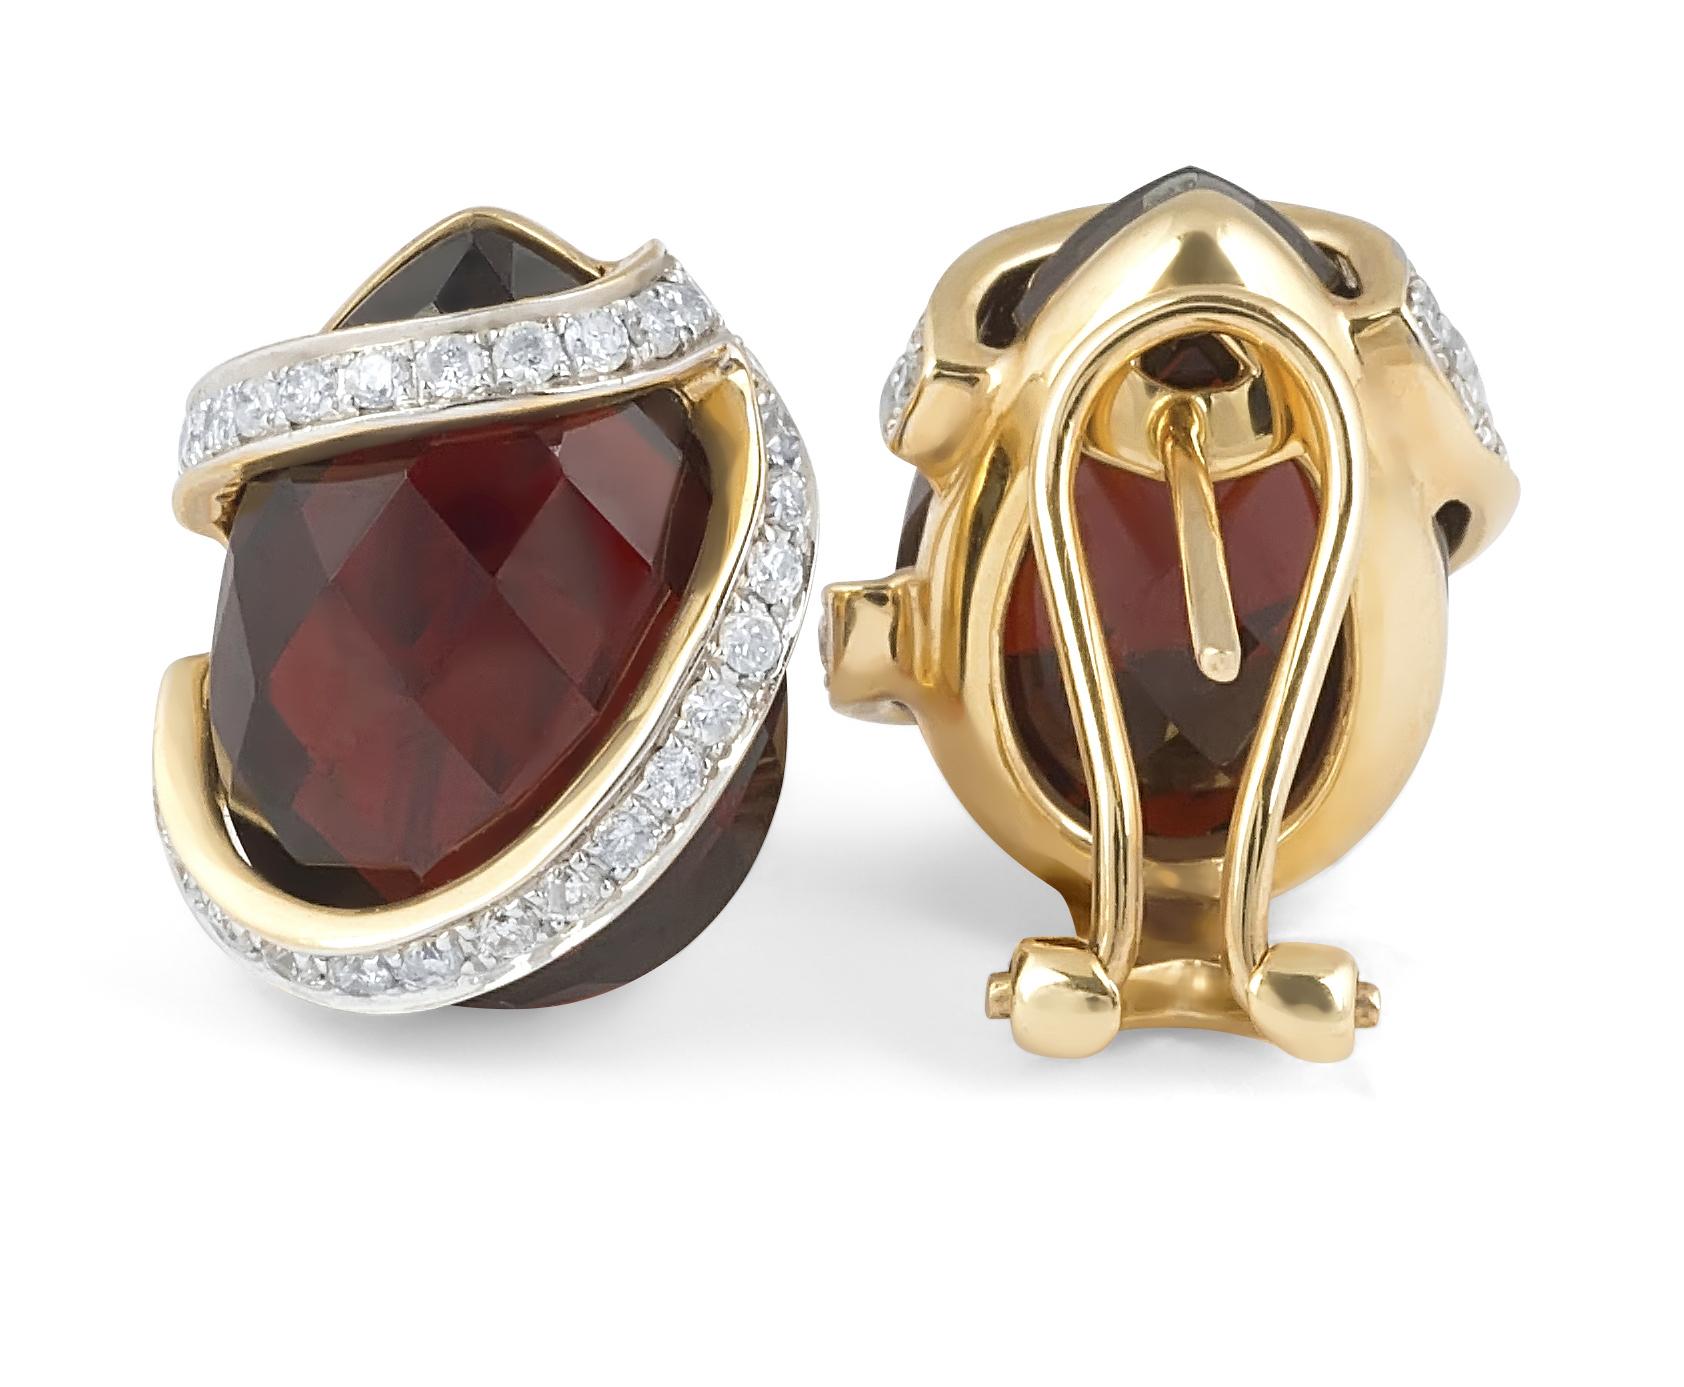 Garnet Diamond Stud Earring in 14 Karat Yellow Gold